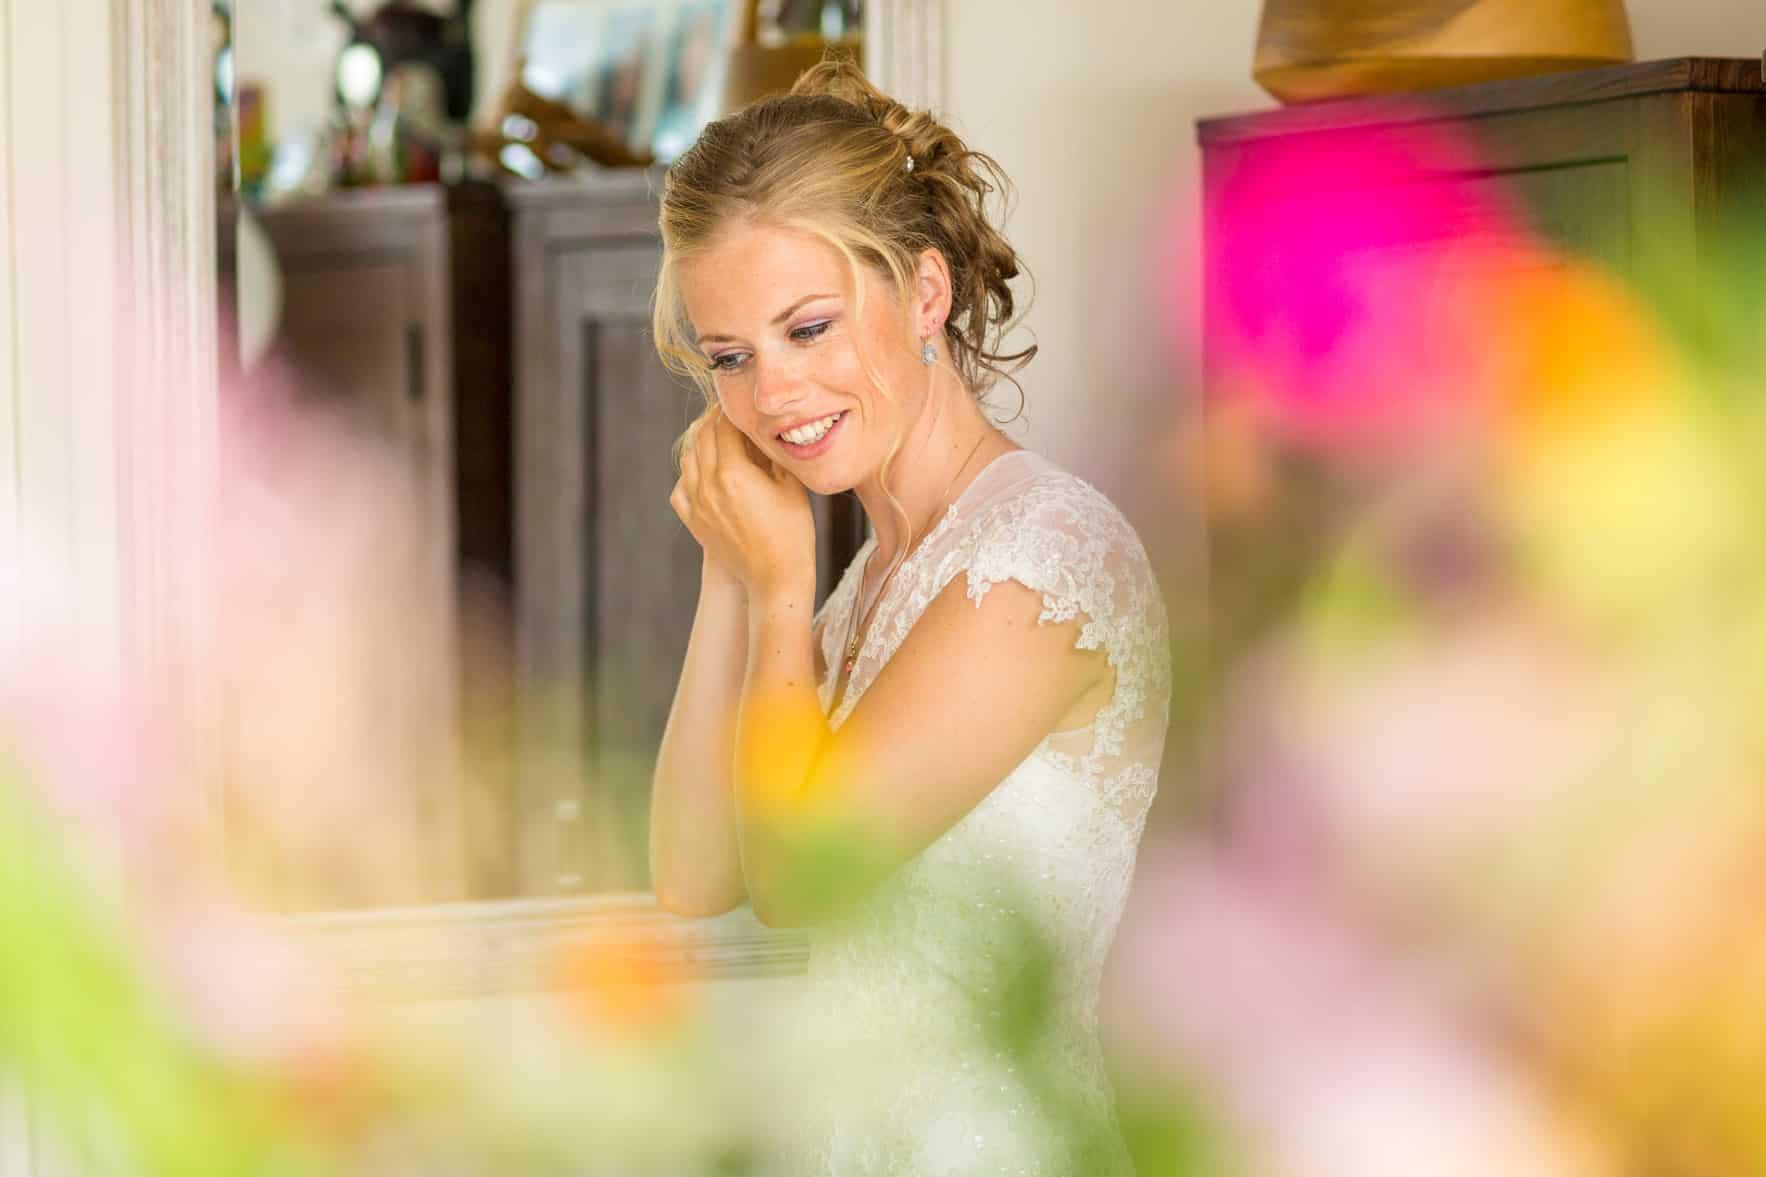 fotograaf Leidschendam bruiloft trouwen